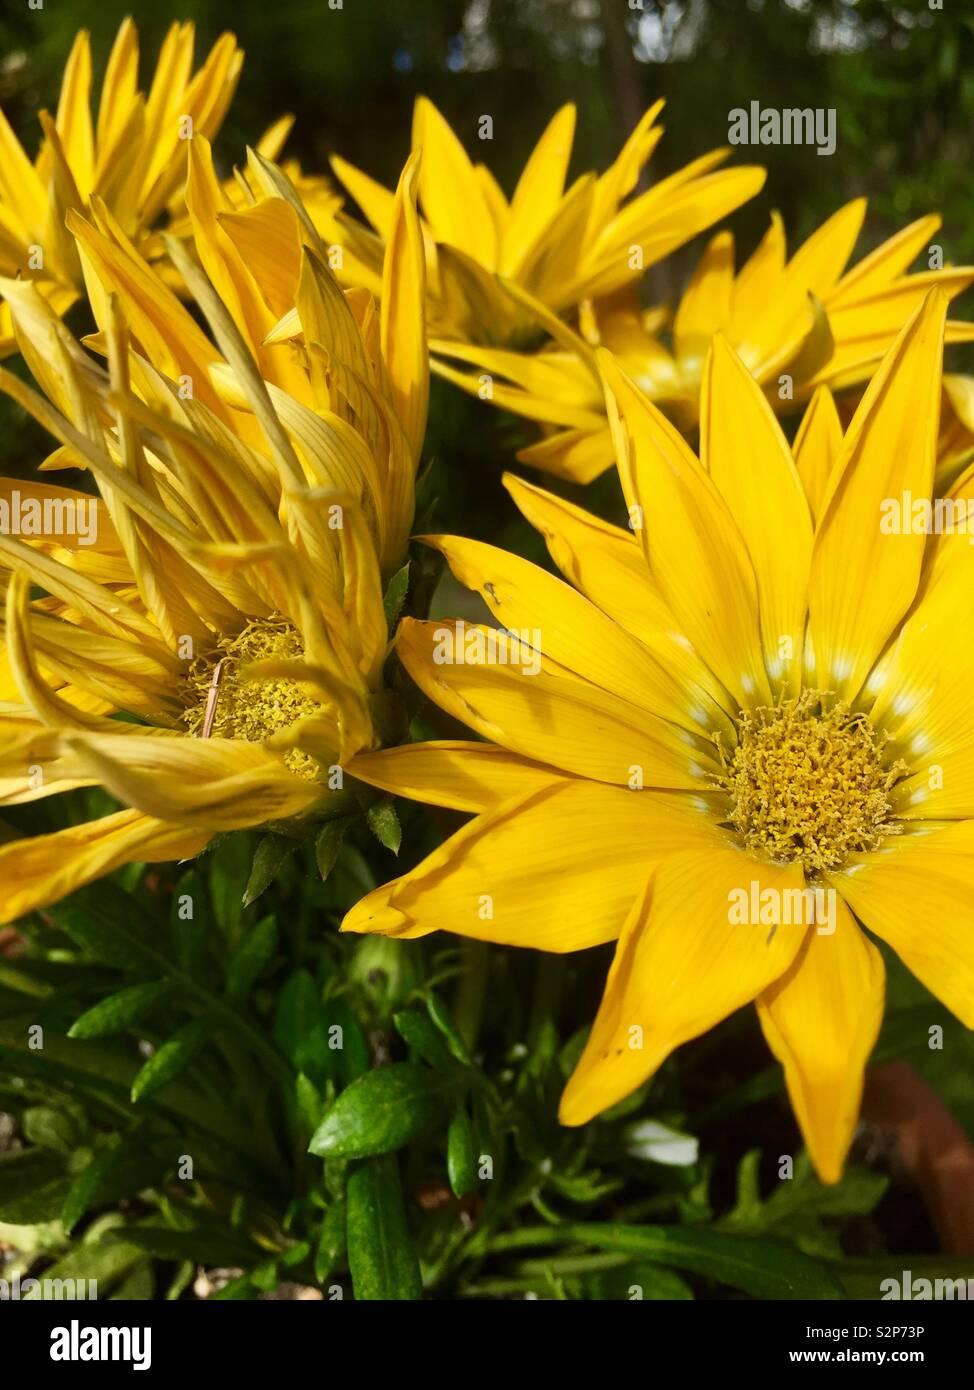 Bright yellow sunflowers in the beautiful island of Zakinthos Stock Photo